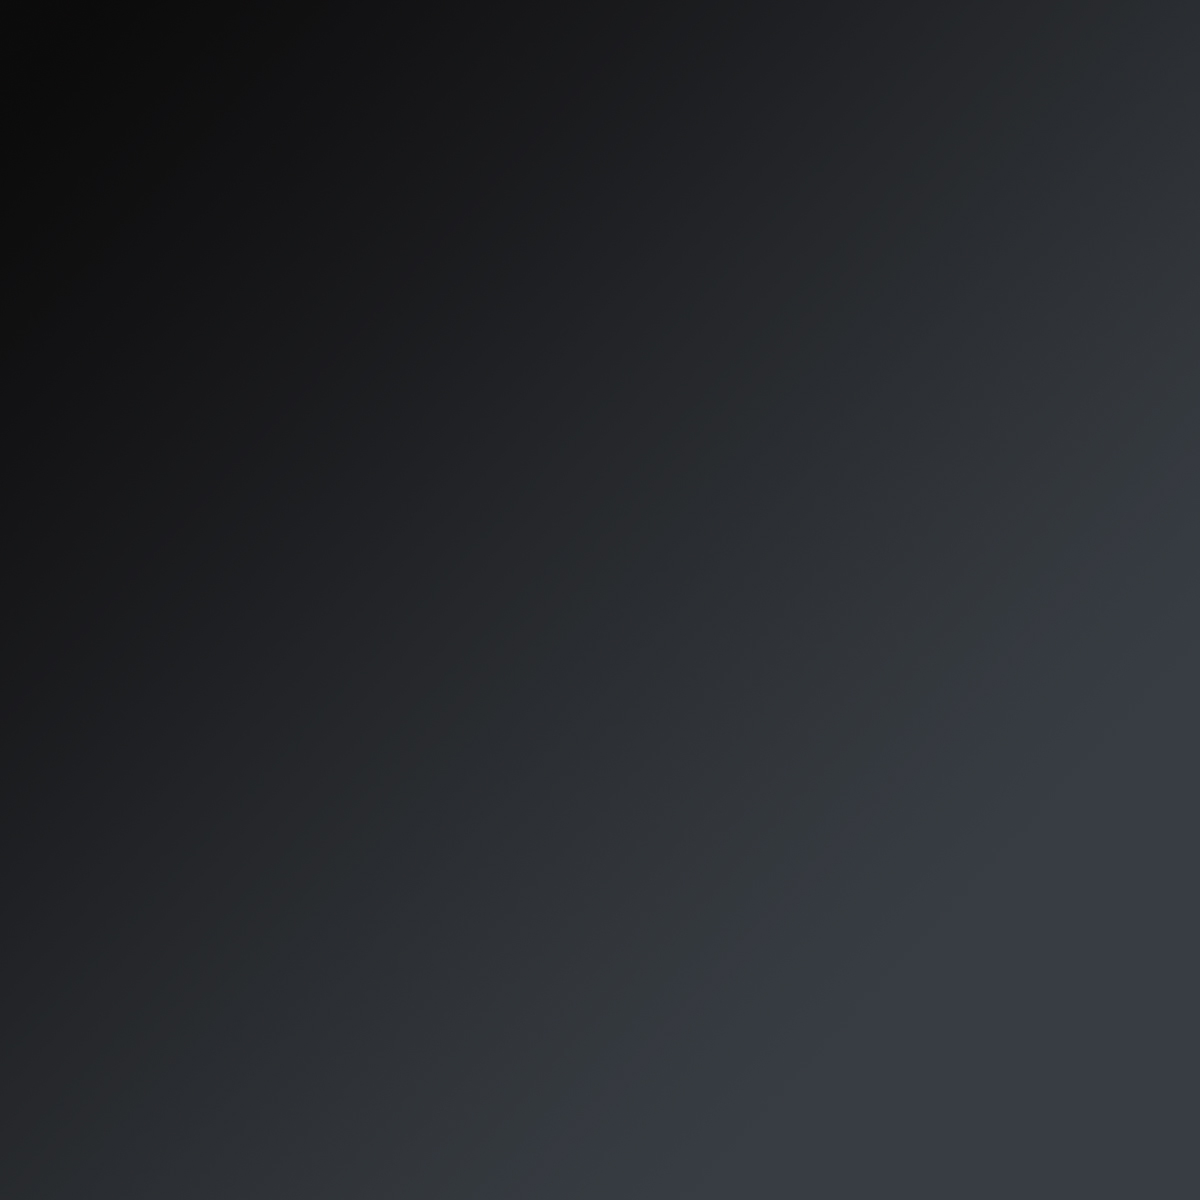 Knapstein Jill-T LED Tischleuchte 61.624.07